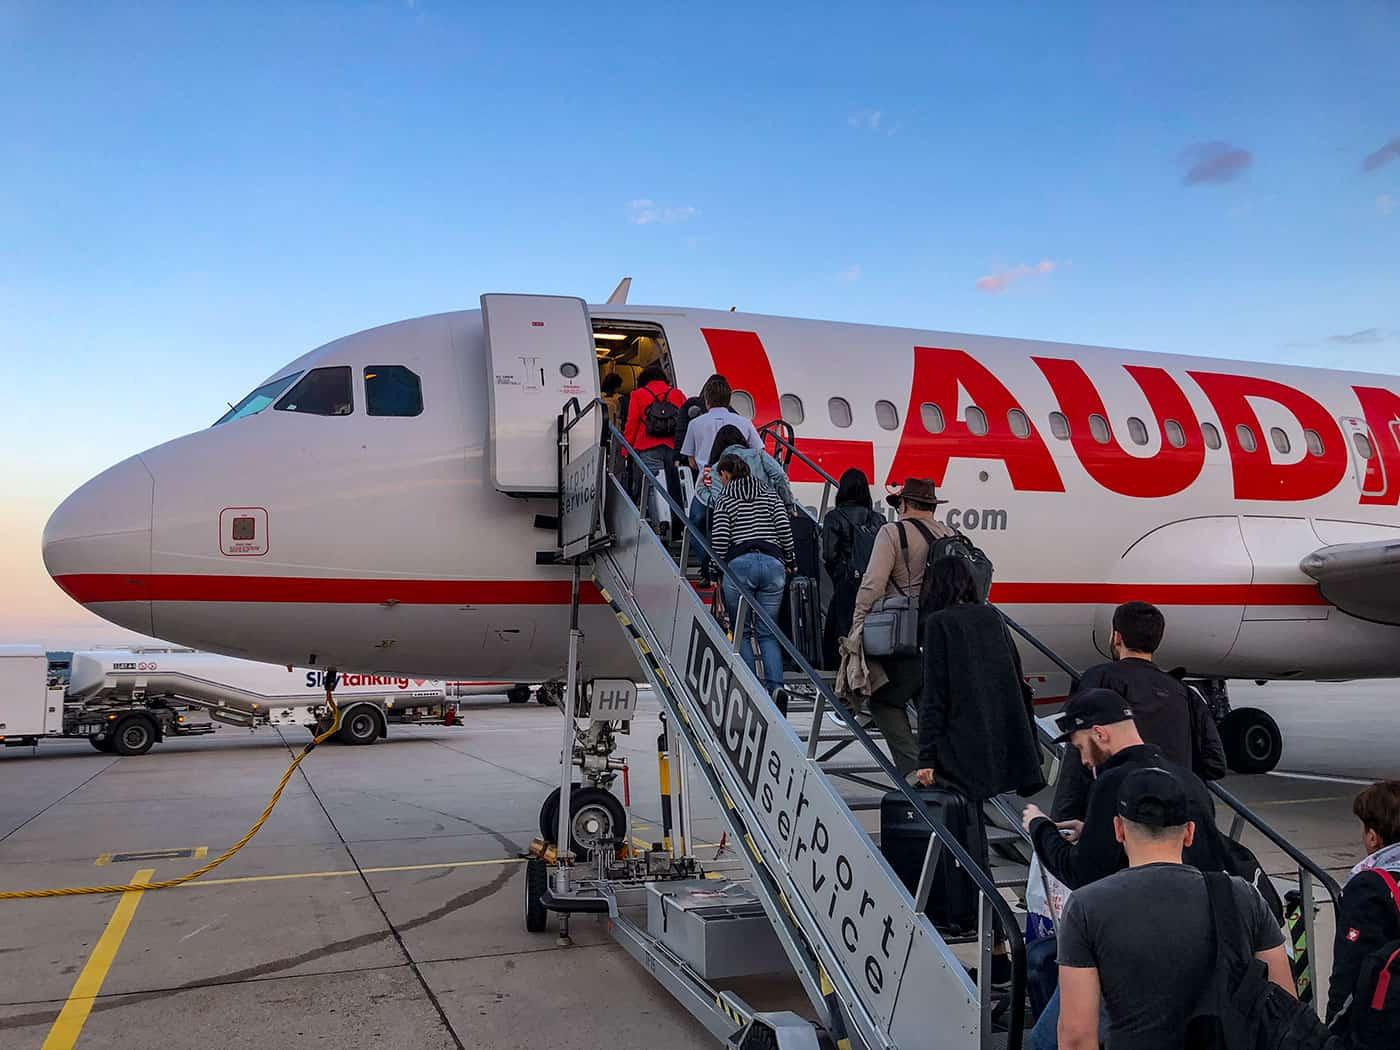 Lauda Boing 320 at Stuttgart Airport